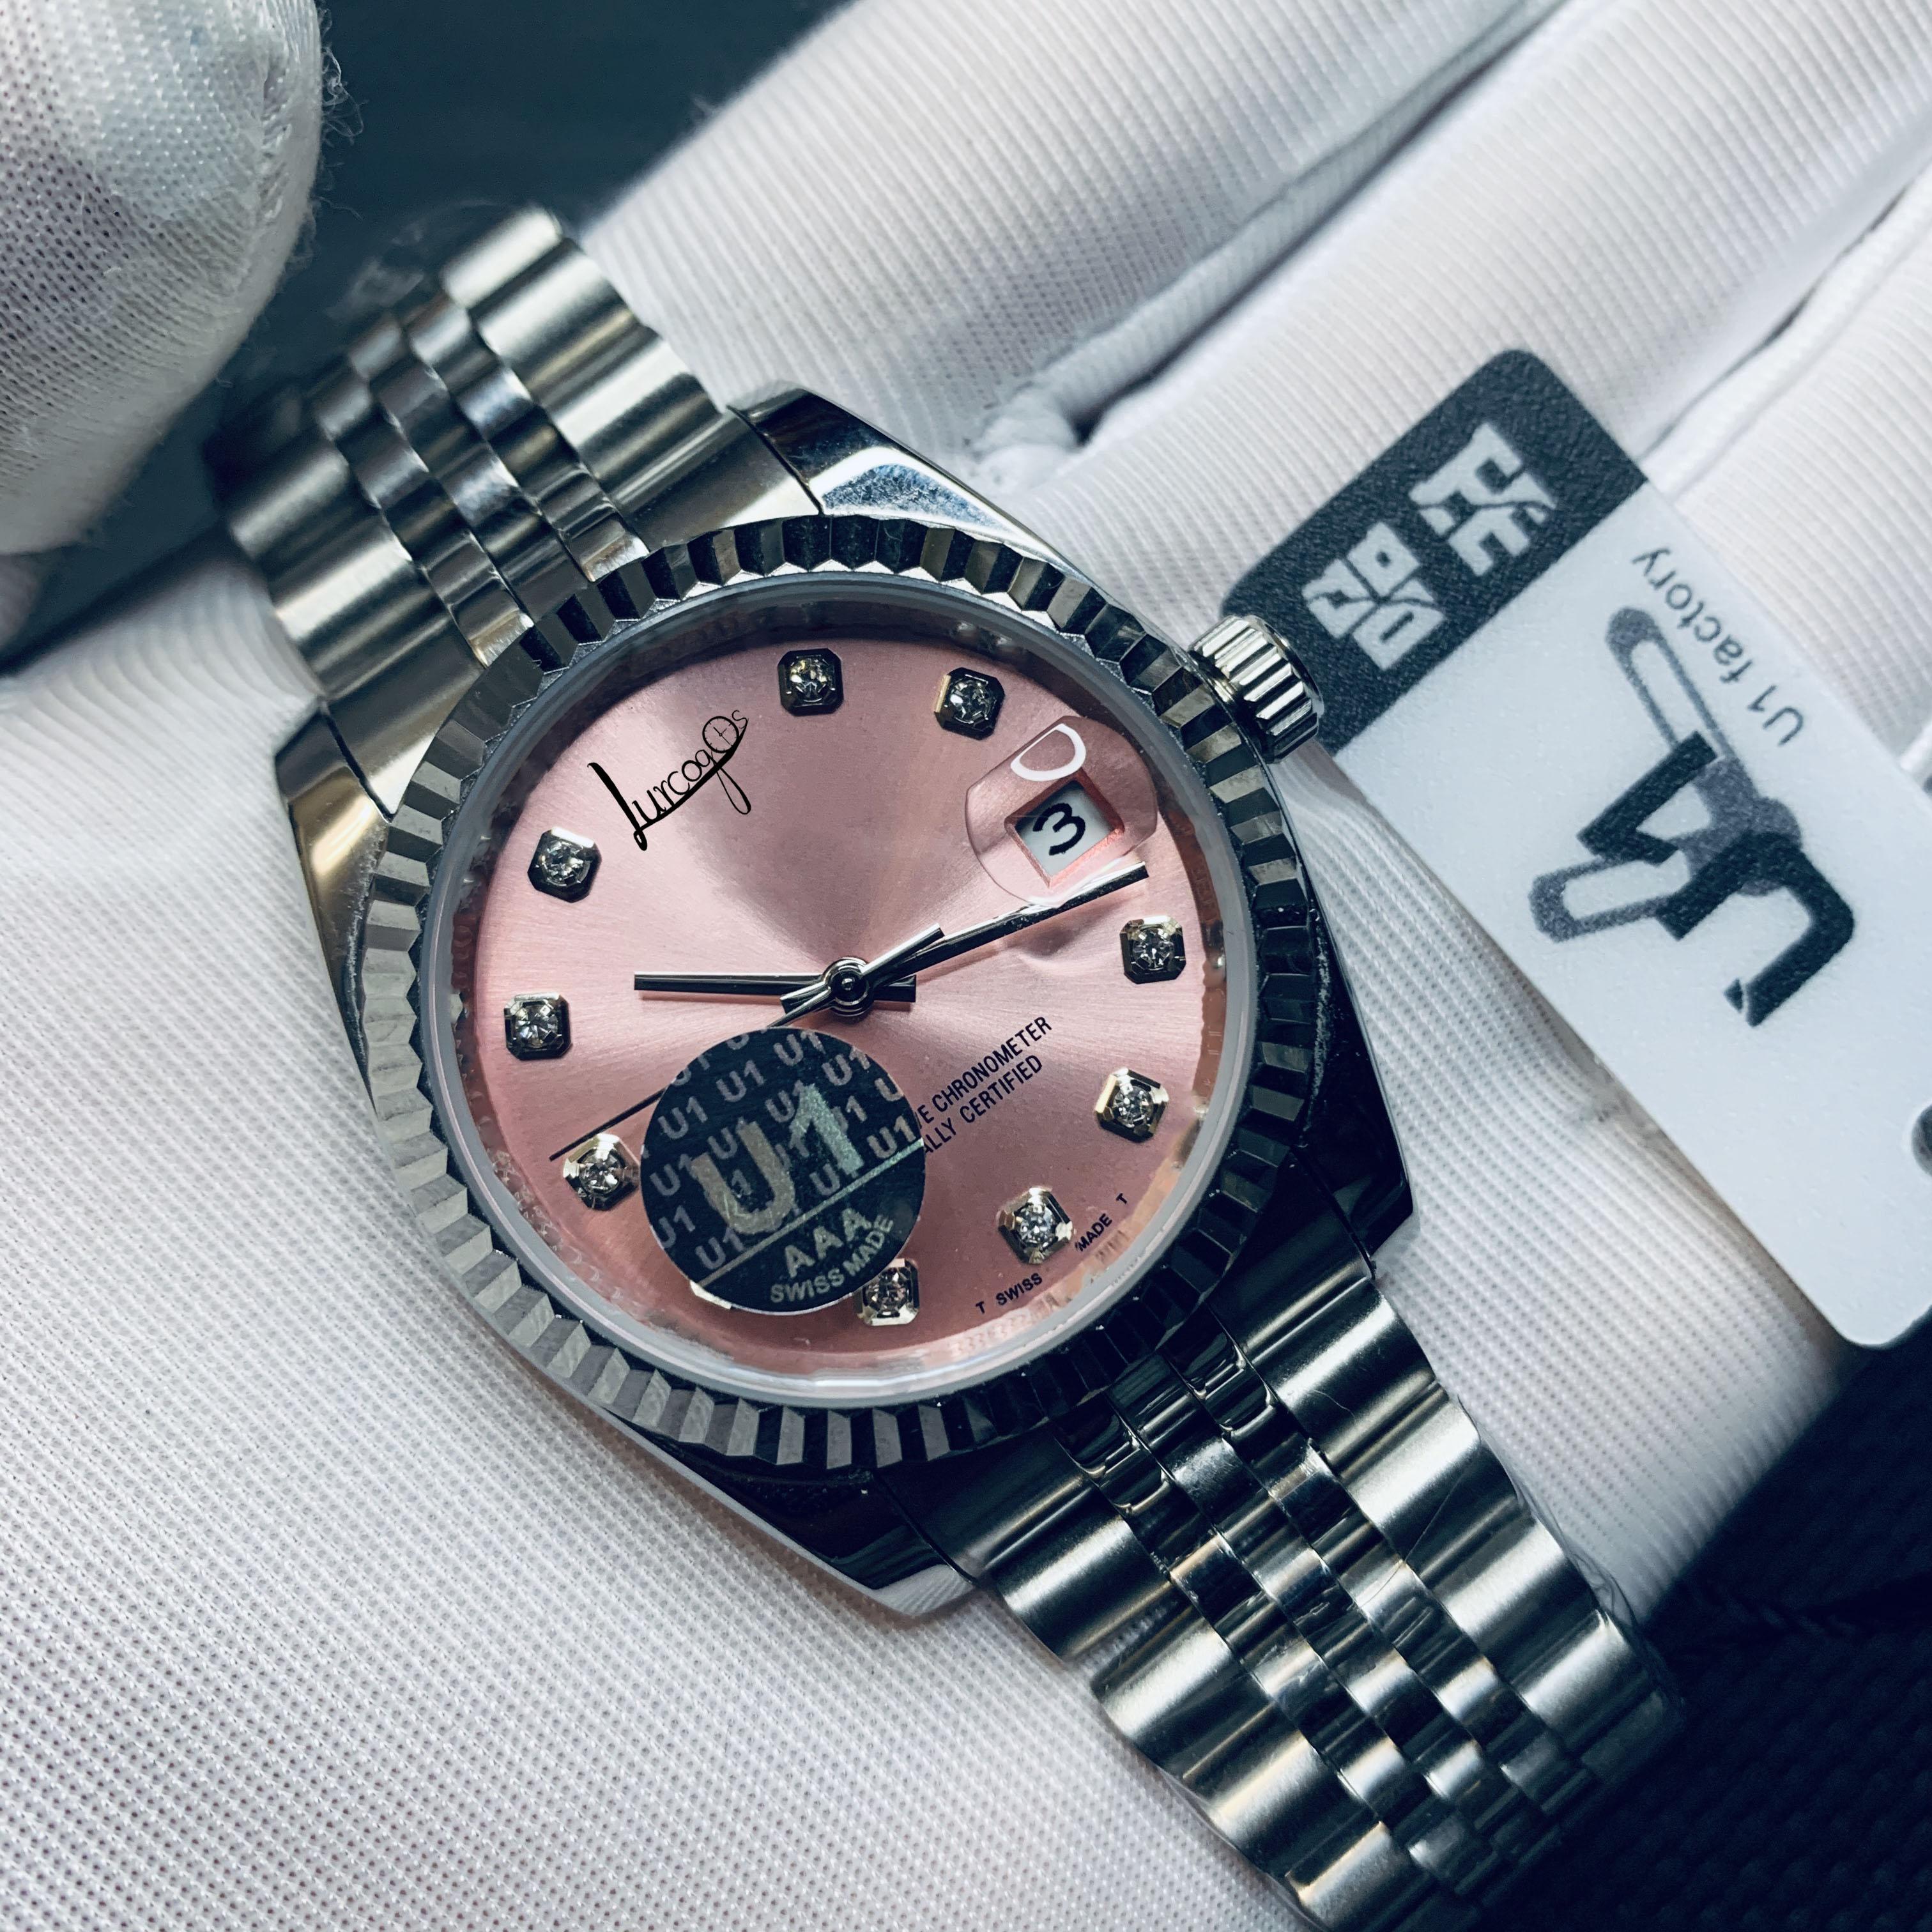 Designer watch new high-quality luxury brand pink dial men's self-winding self-winding movement AAA watch date